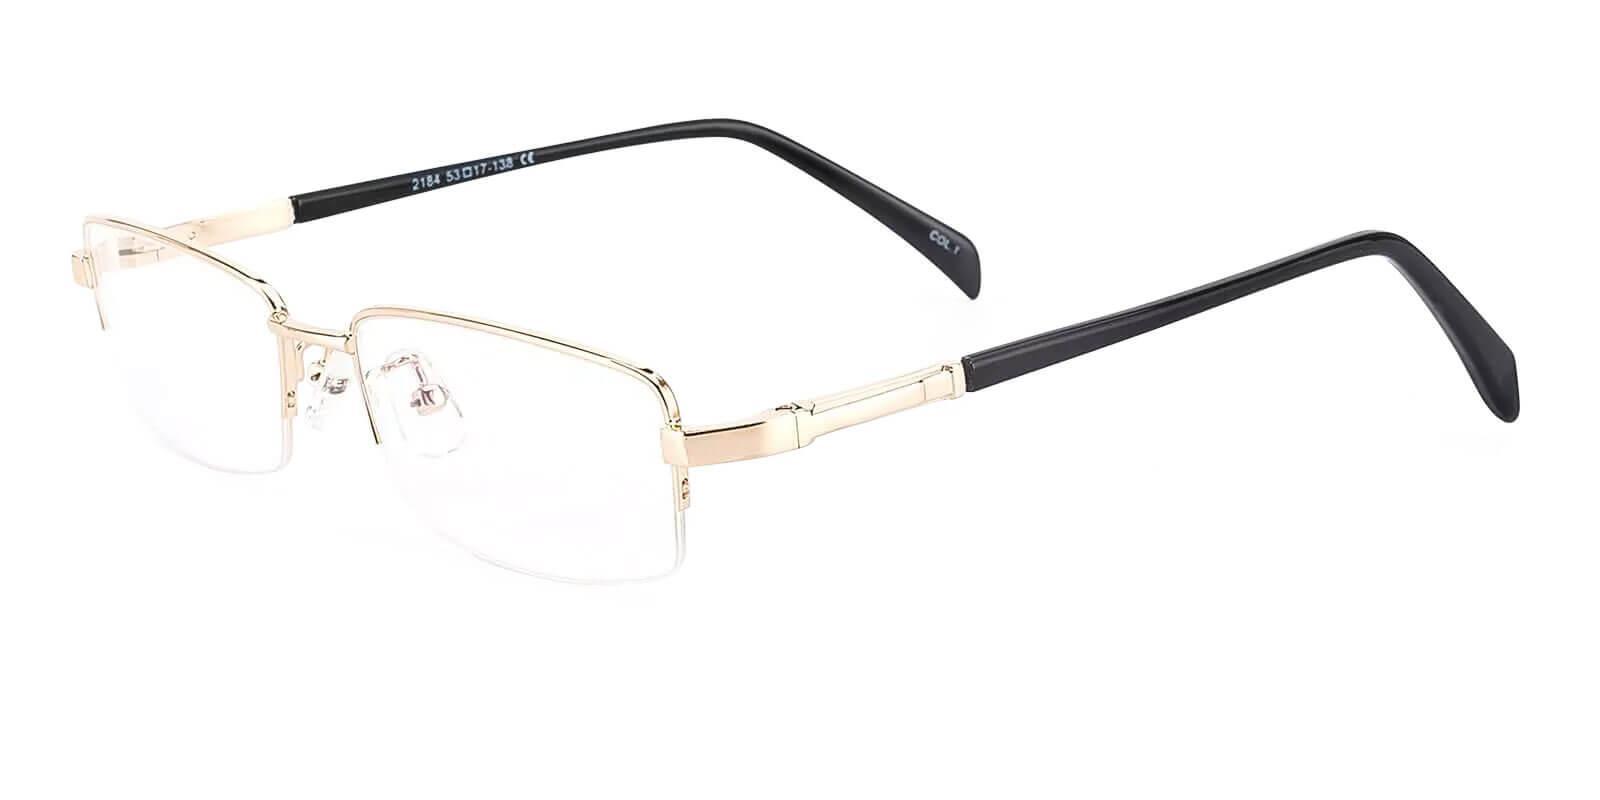 Michael Gold Metal Eyeglasses , NosePads , SpringHinges Frames from ABBE Glasses